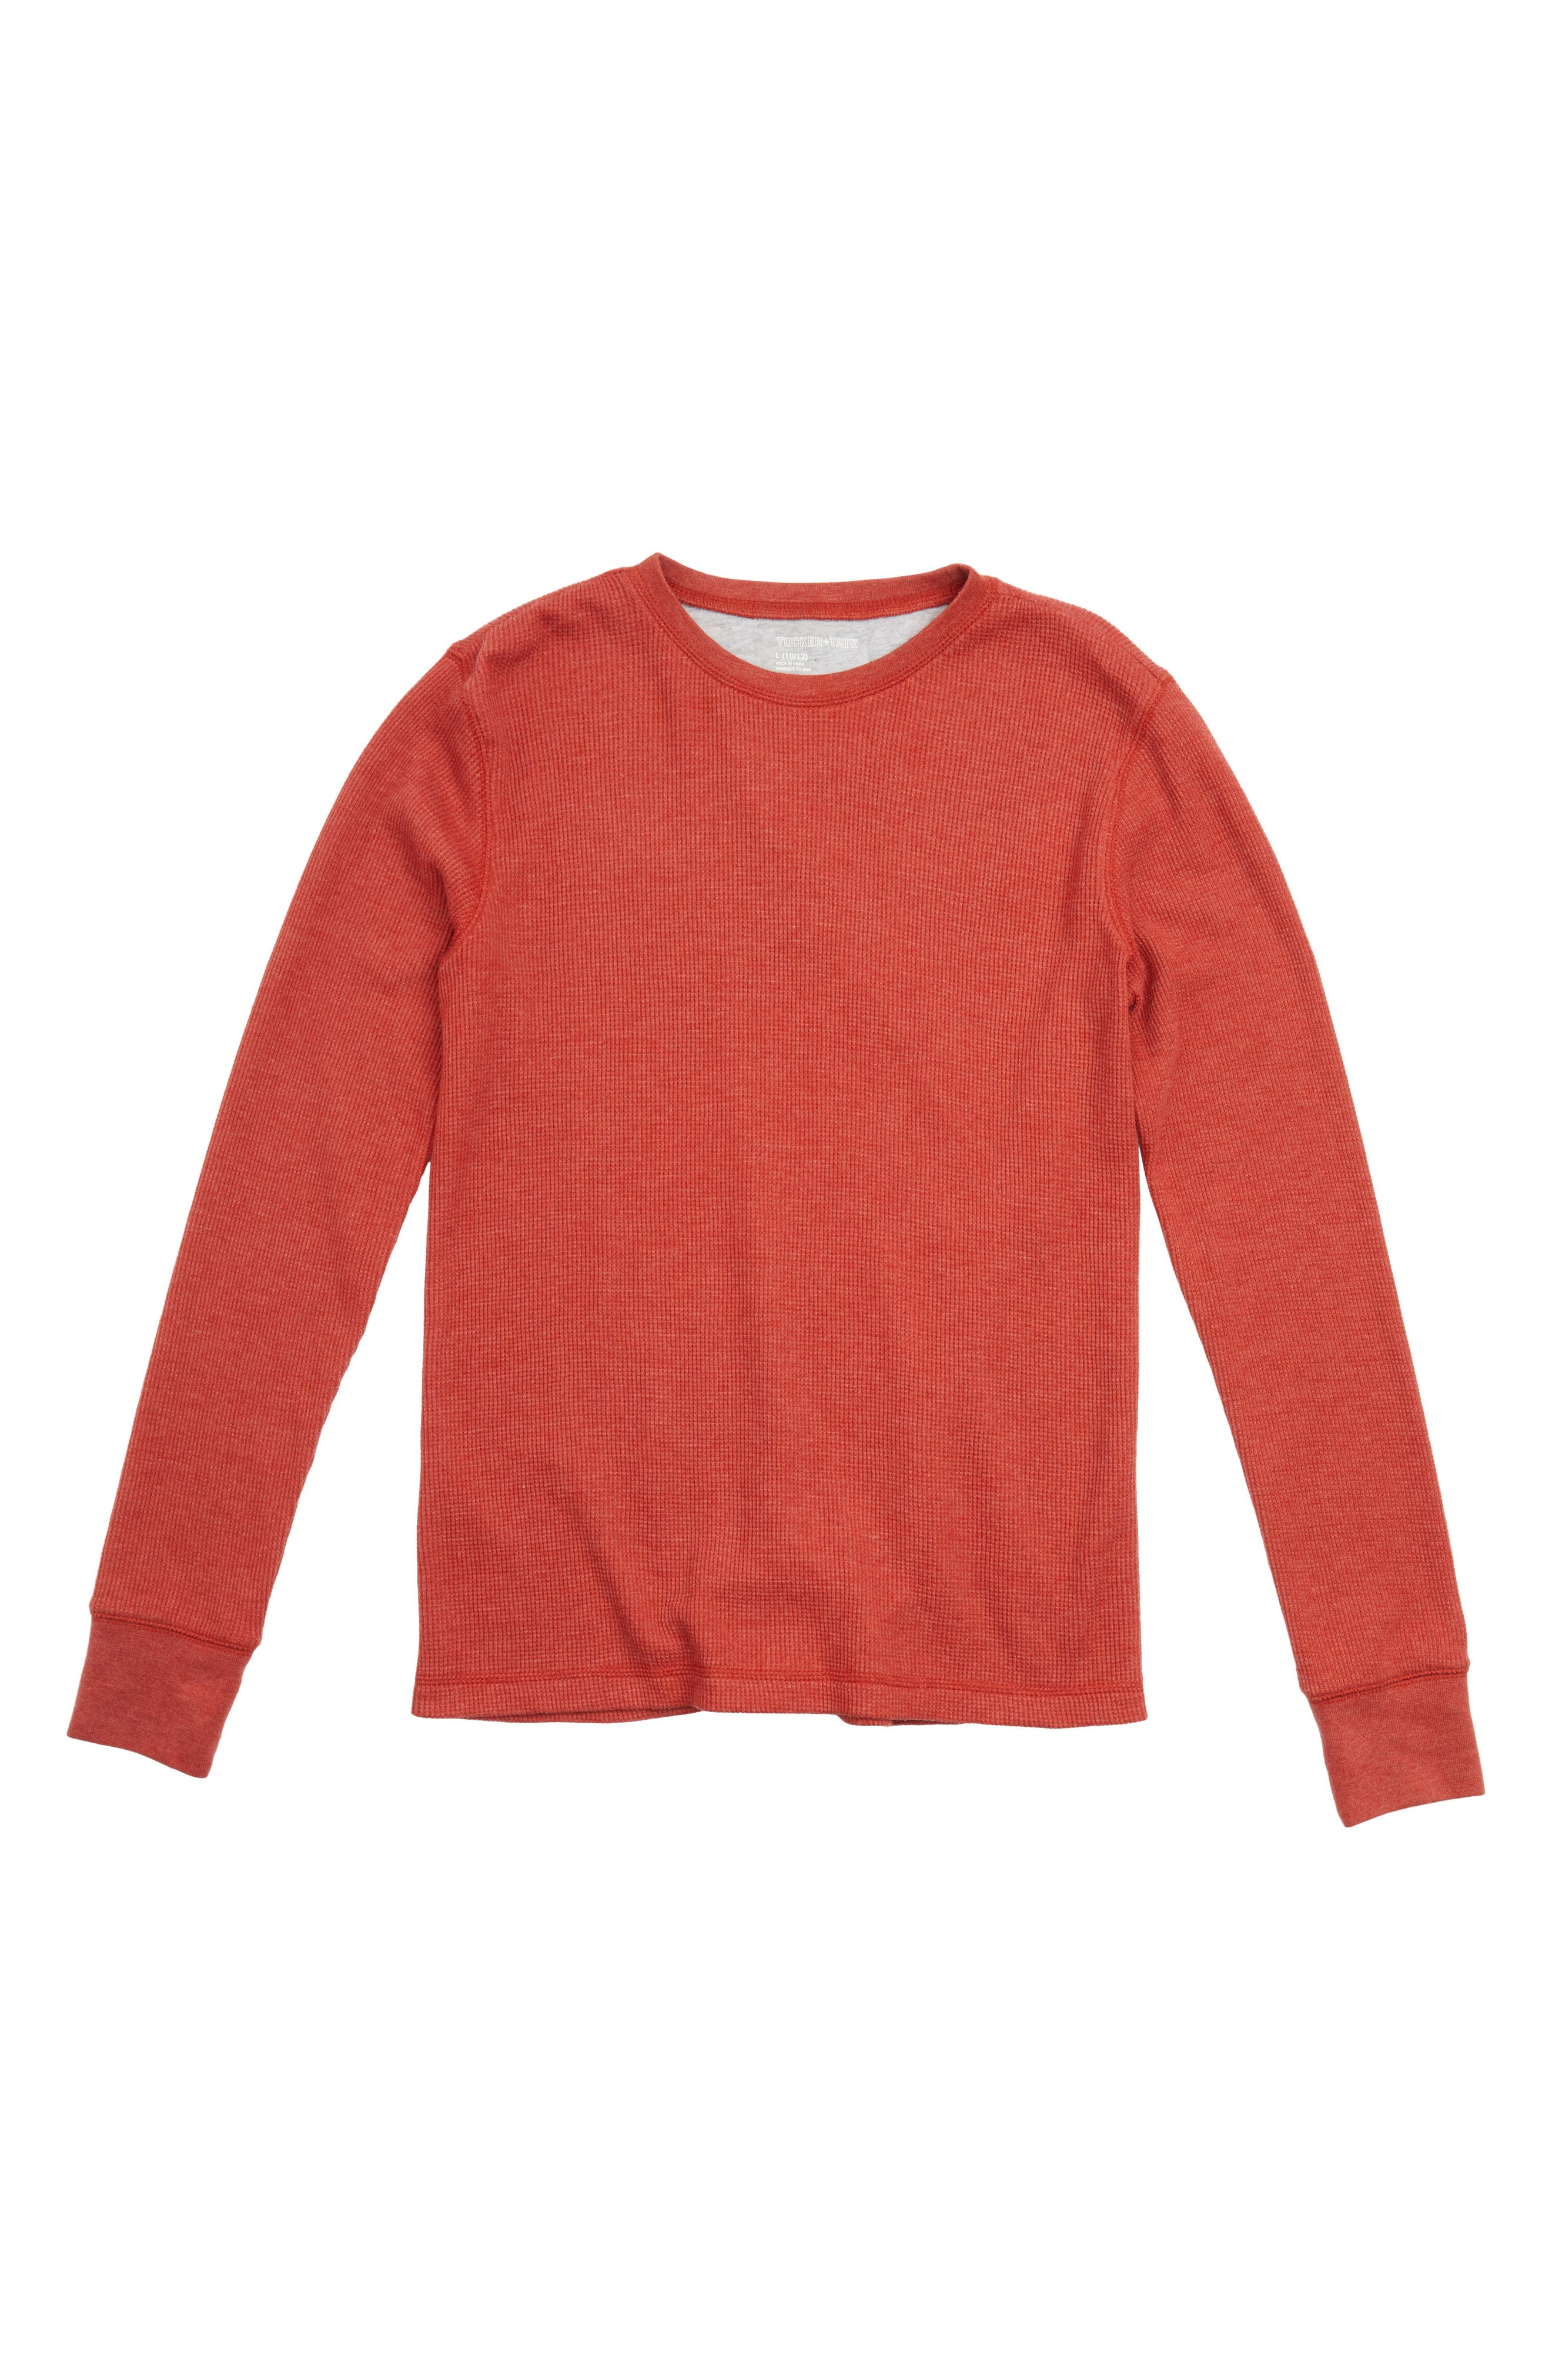 Main Image - Tucker + Tate Long Sleeve Thermal T-Shirt (Big Boys)